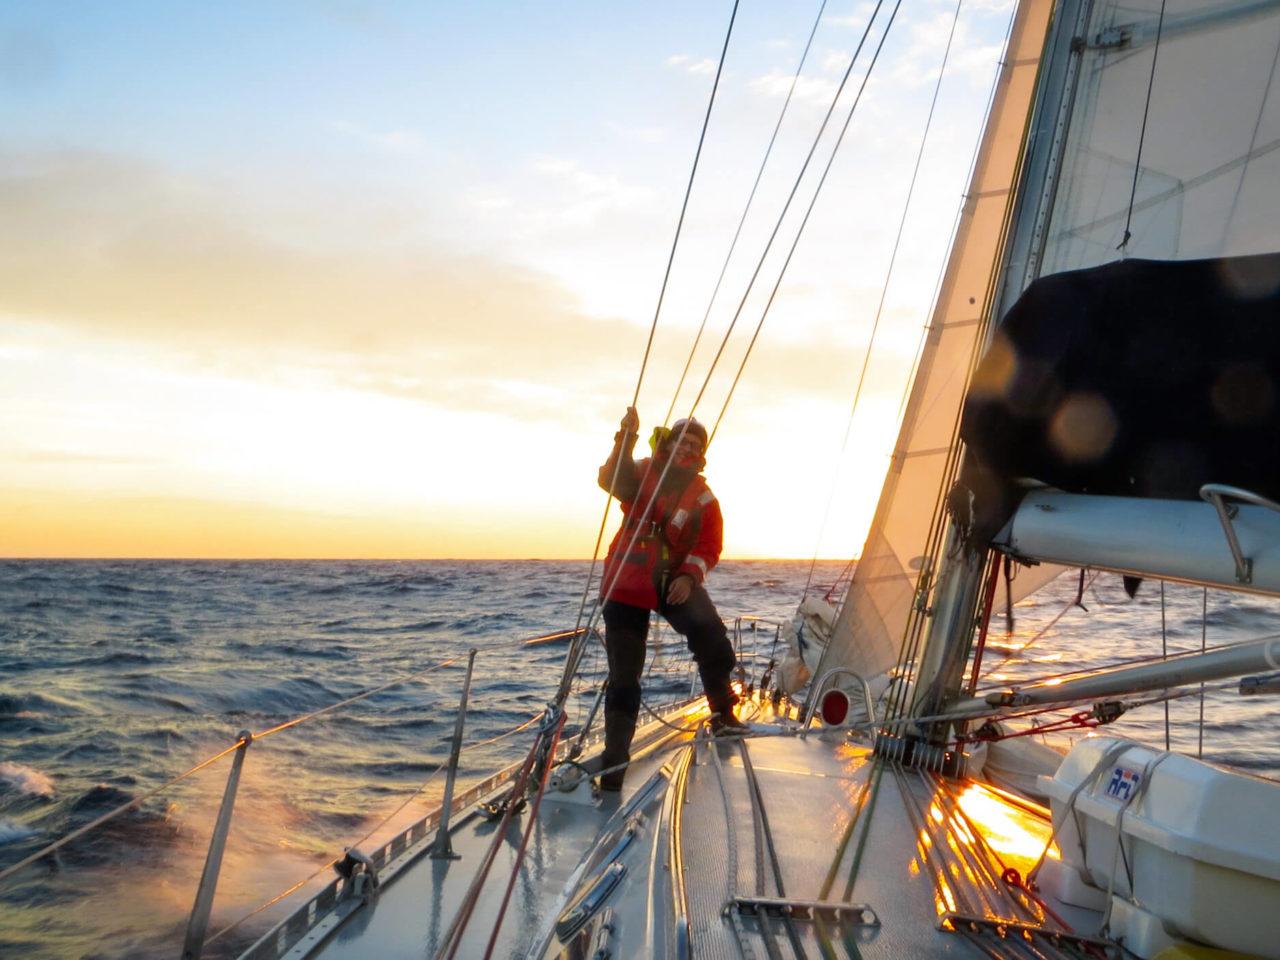 Flying-FIsh-Sailing--036